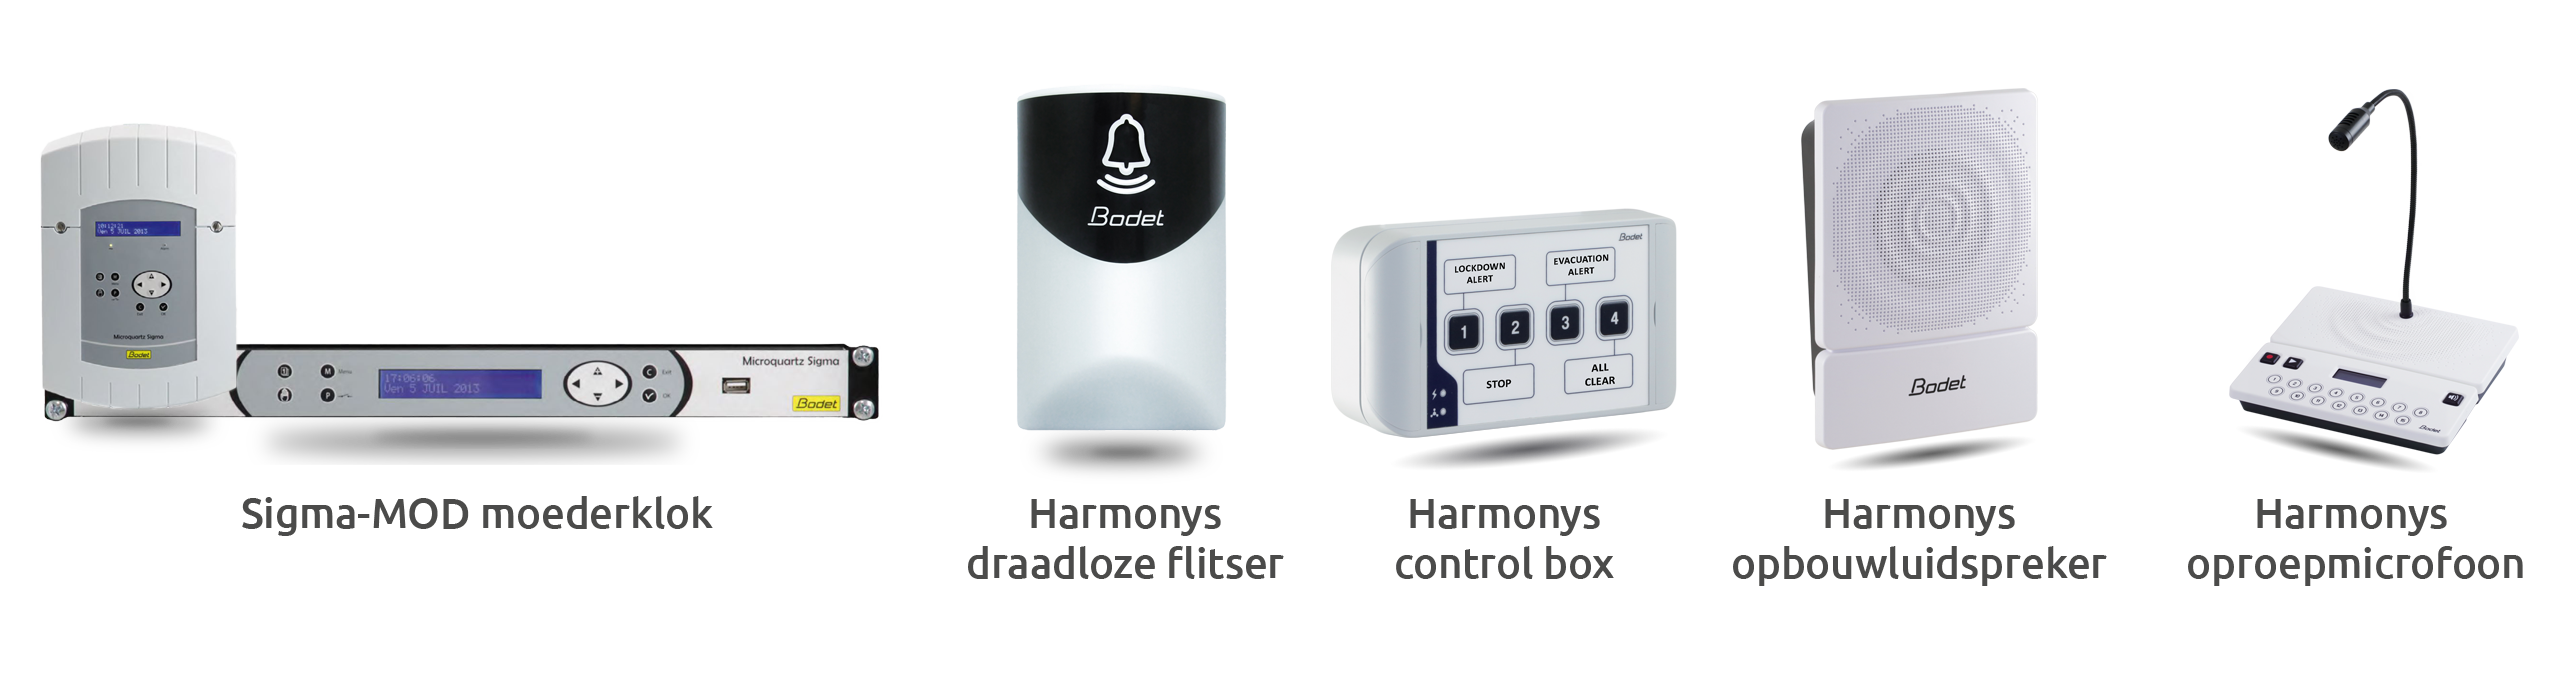 Bodet tijdsignaleringssysteem harmonys